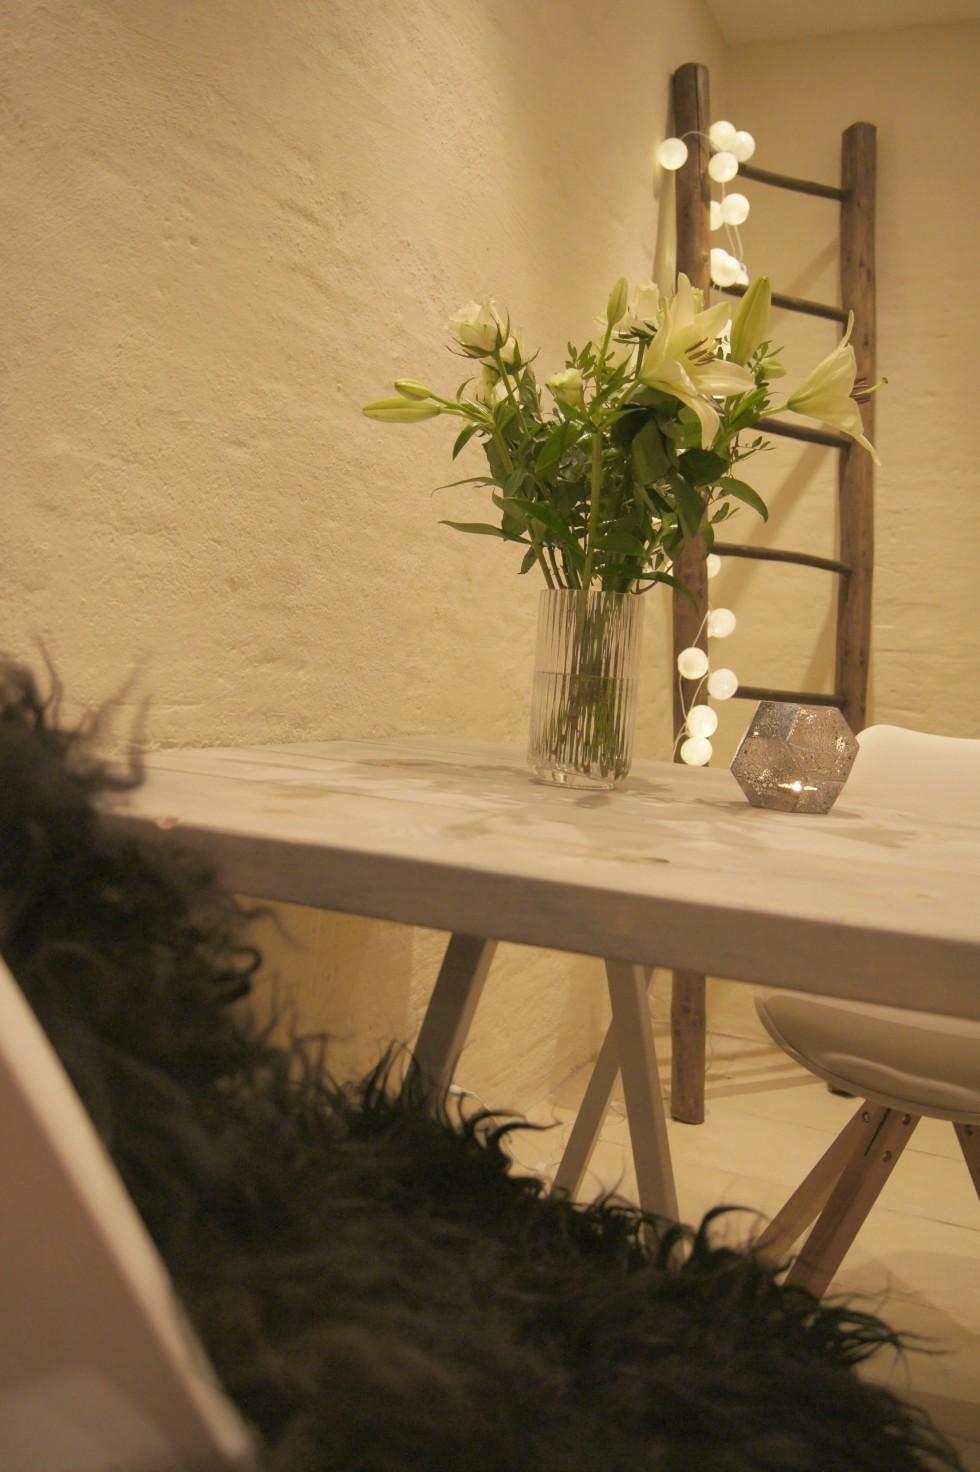 Guide lav et spisebord med brede planker